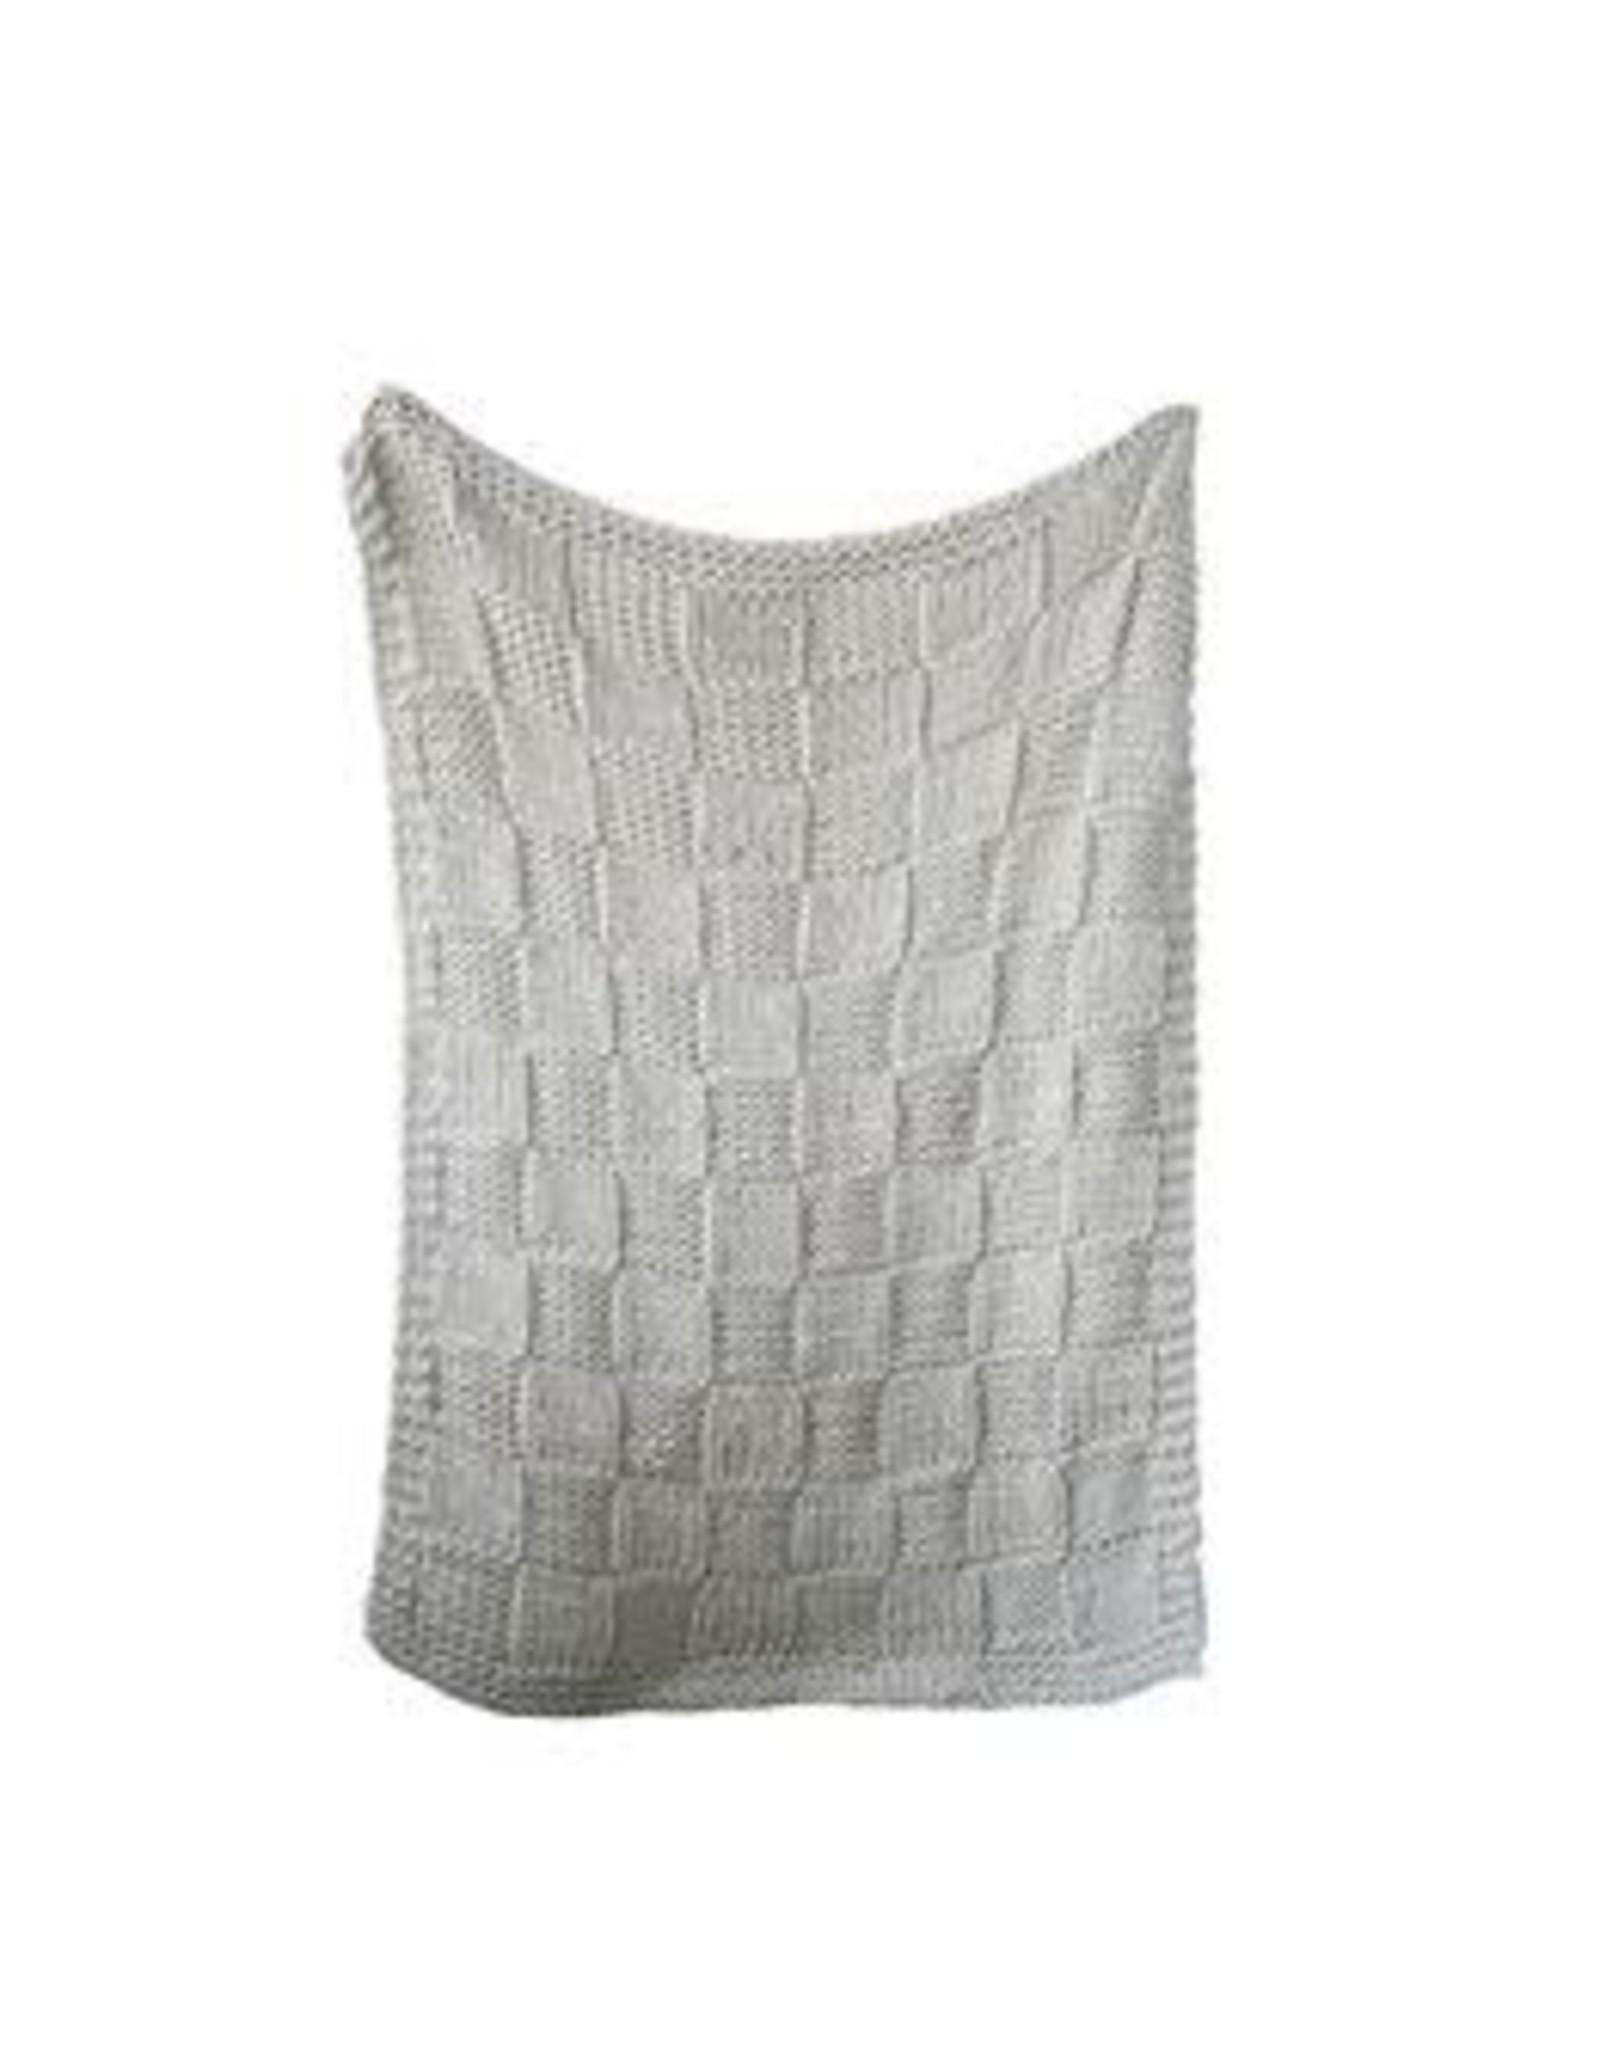 Chunky Knit Acrylic Throw, Natural